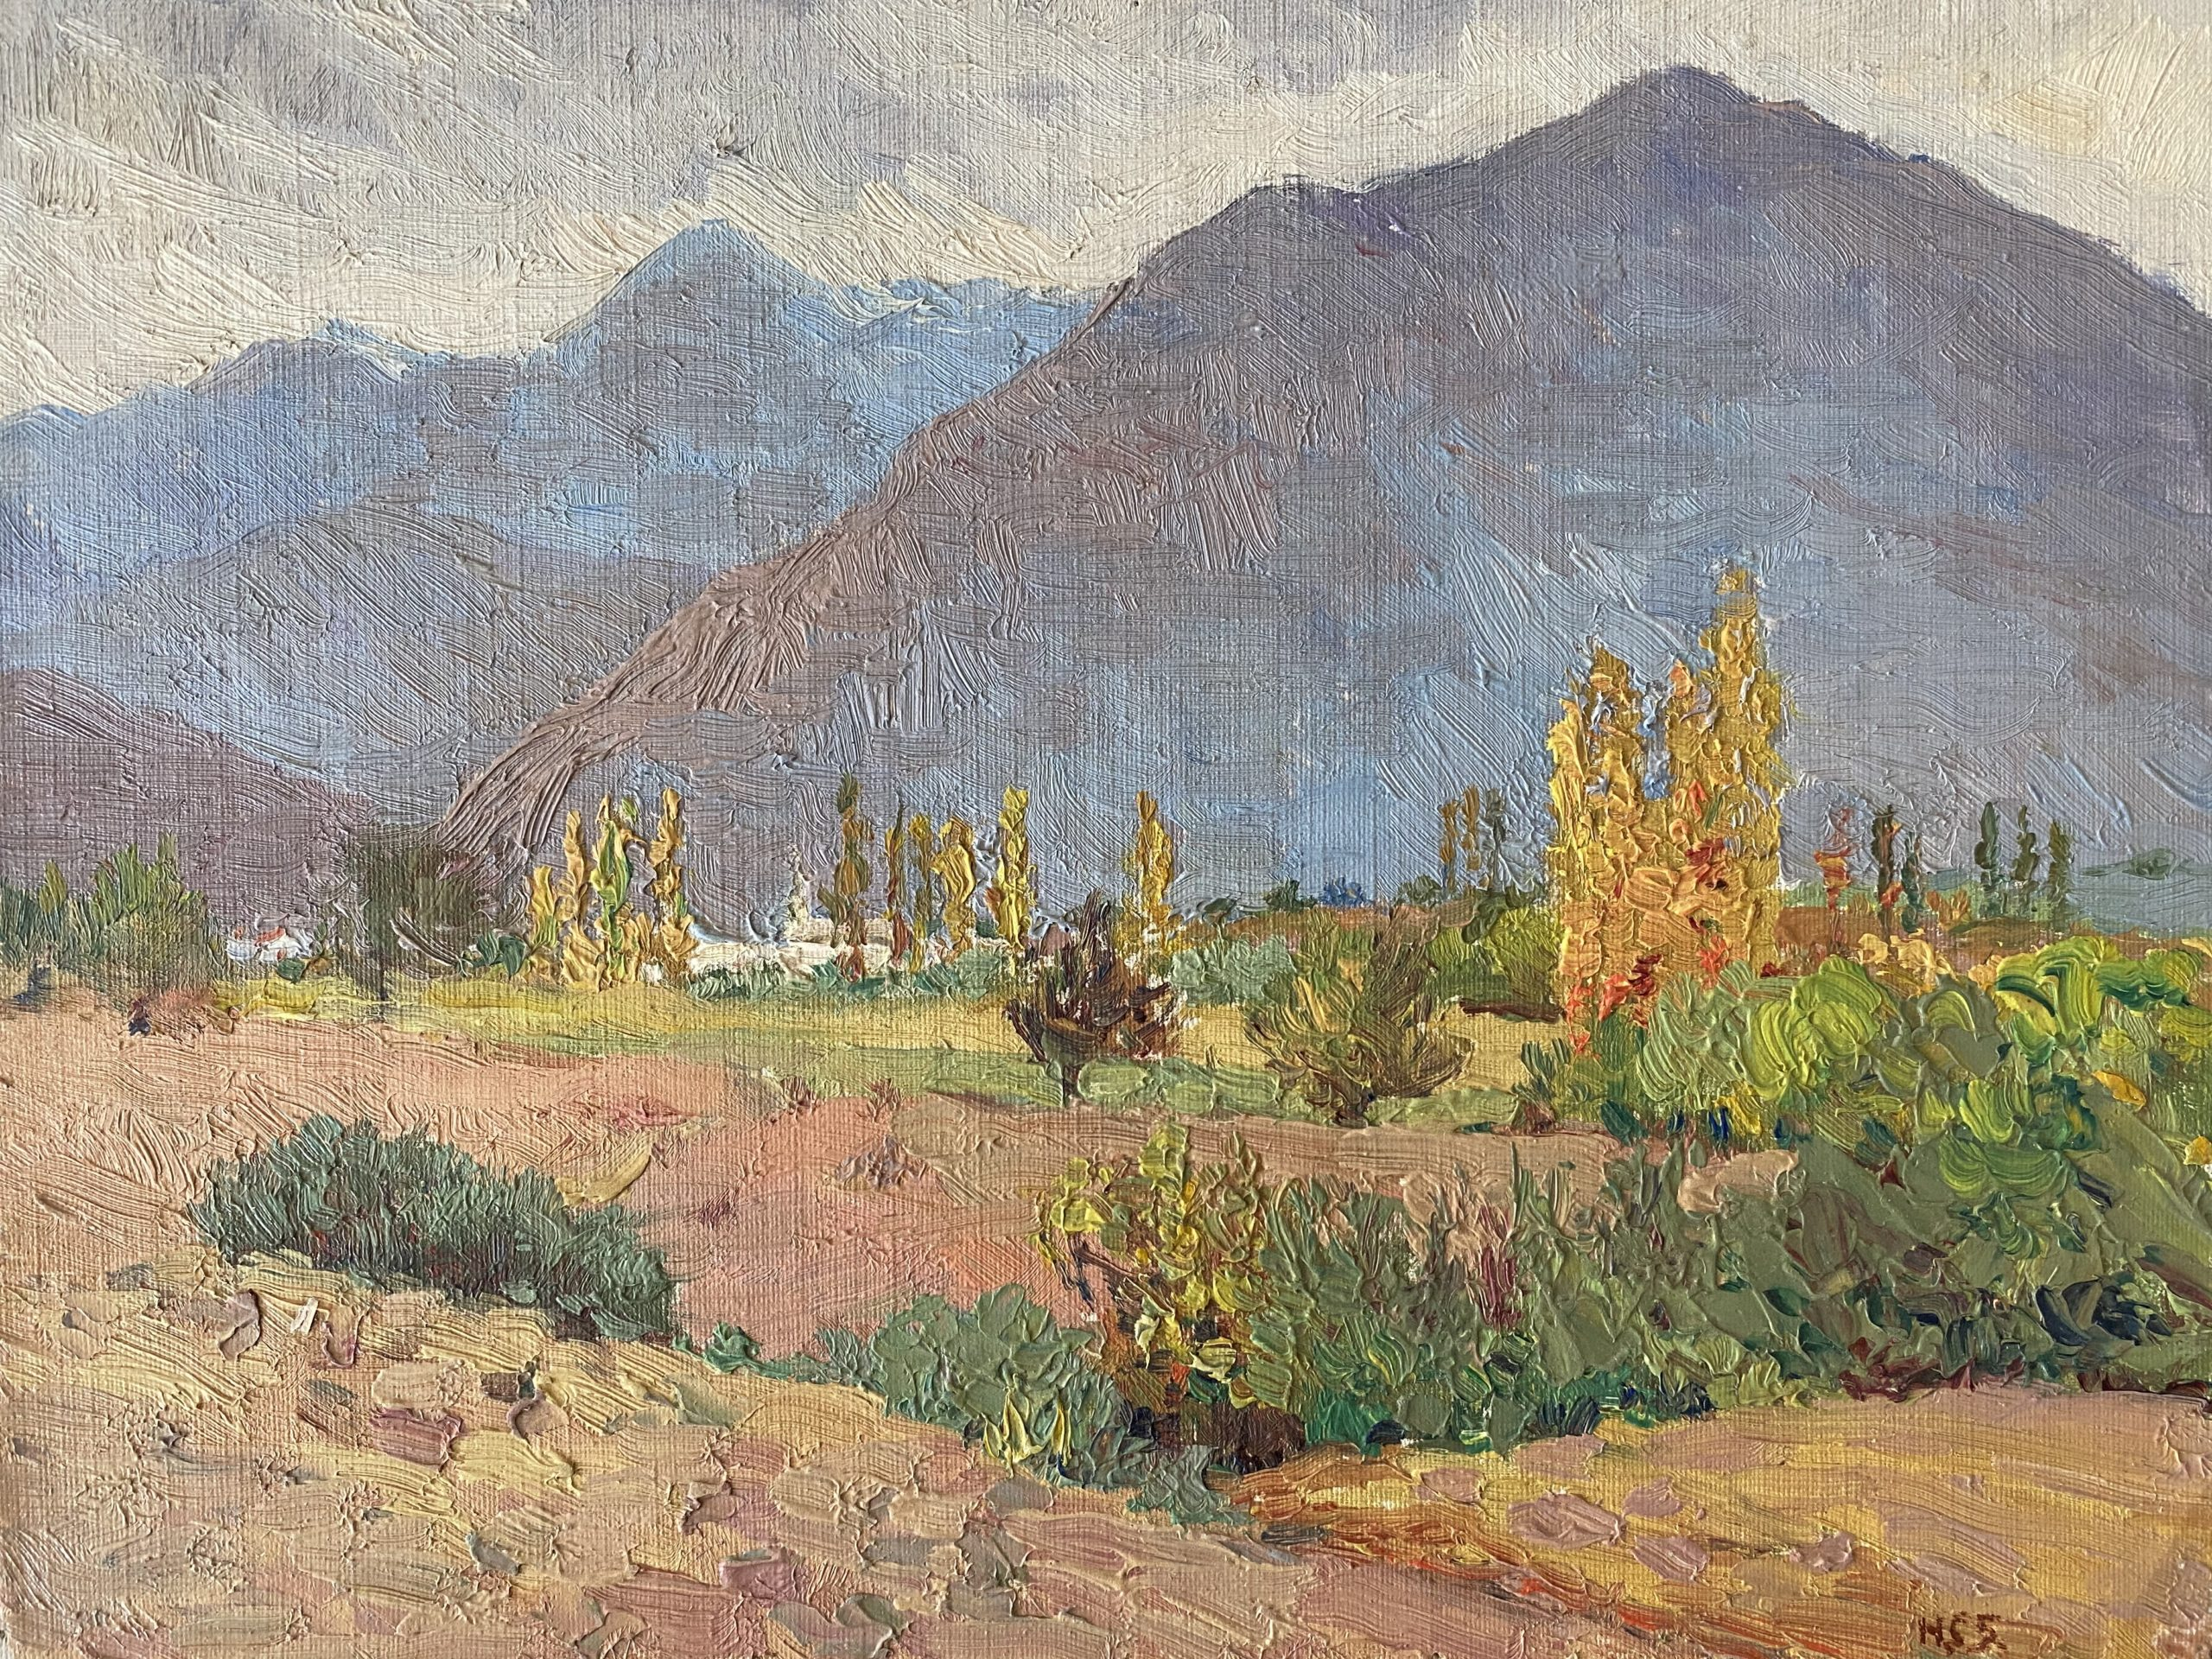 Houghton Cranford Smith Original Oil Painting